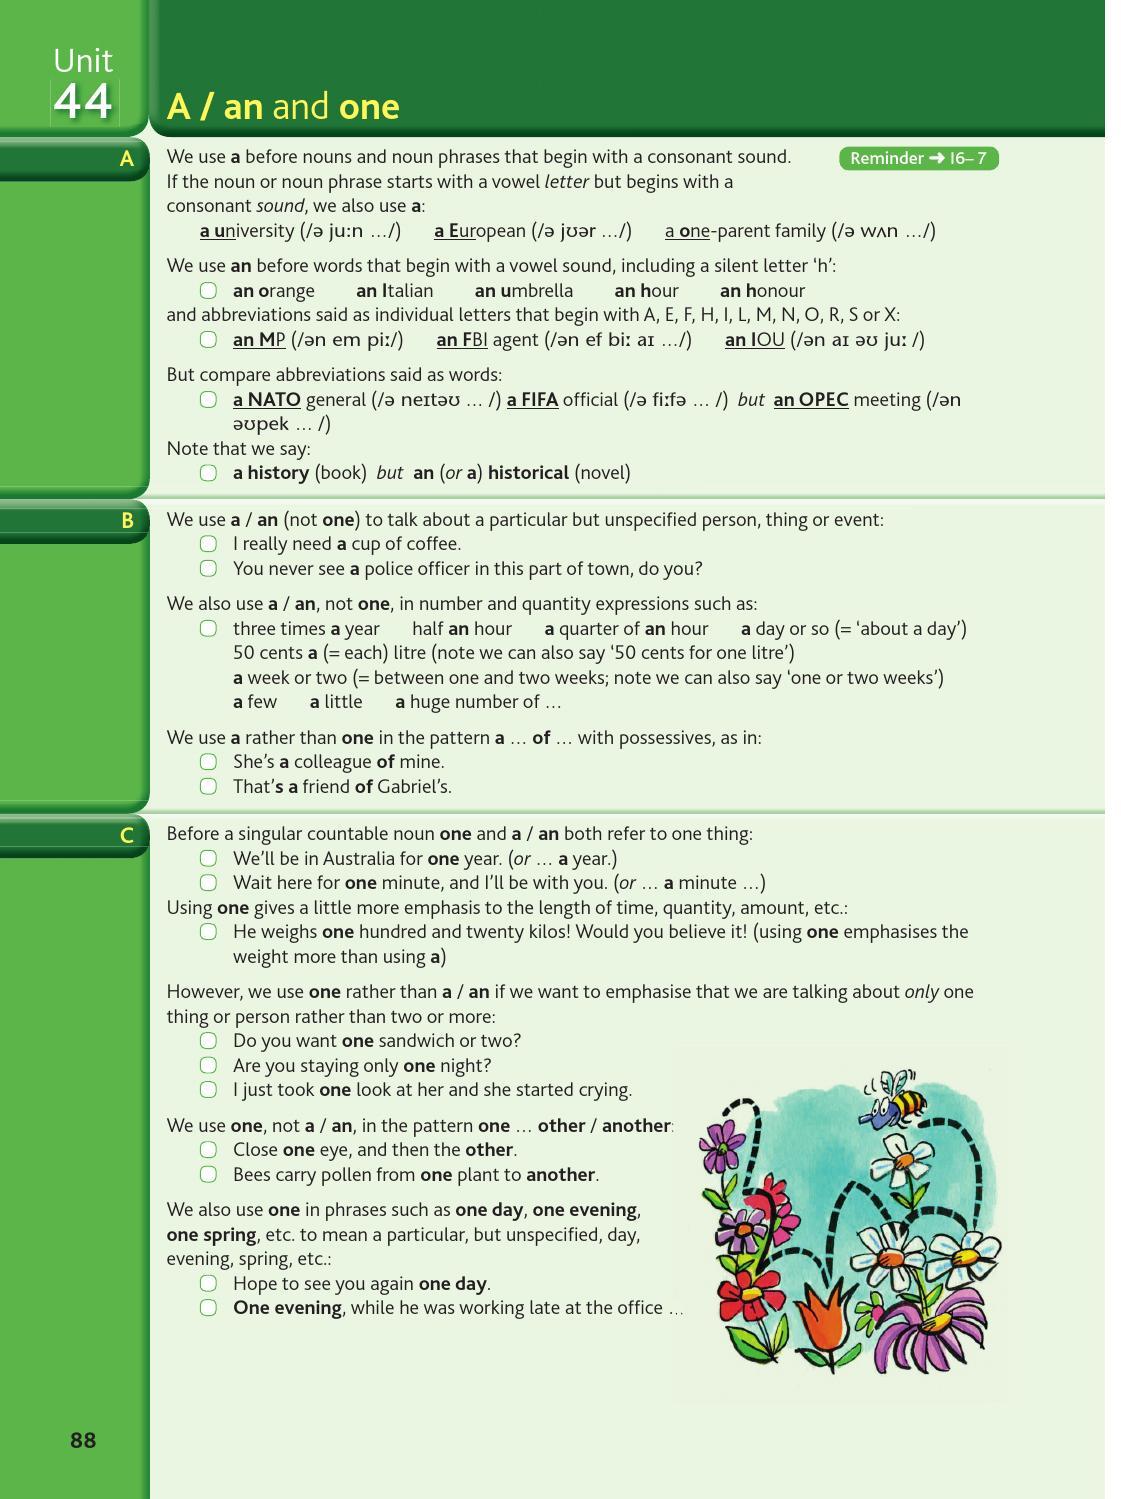 advanced grammar in use sample unit answers unit 44 by advanced grammar in use sample unit answers unit 44 by cambridge university press issuu